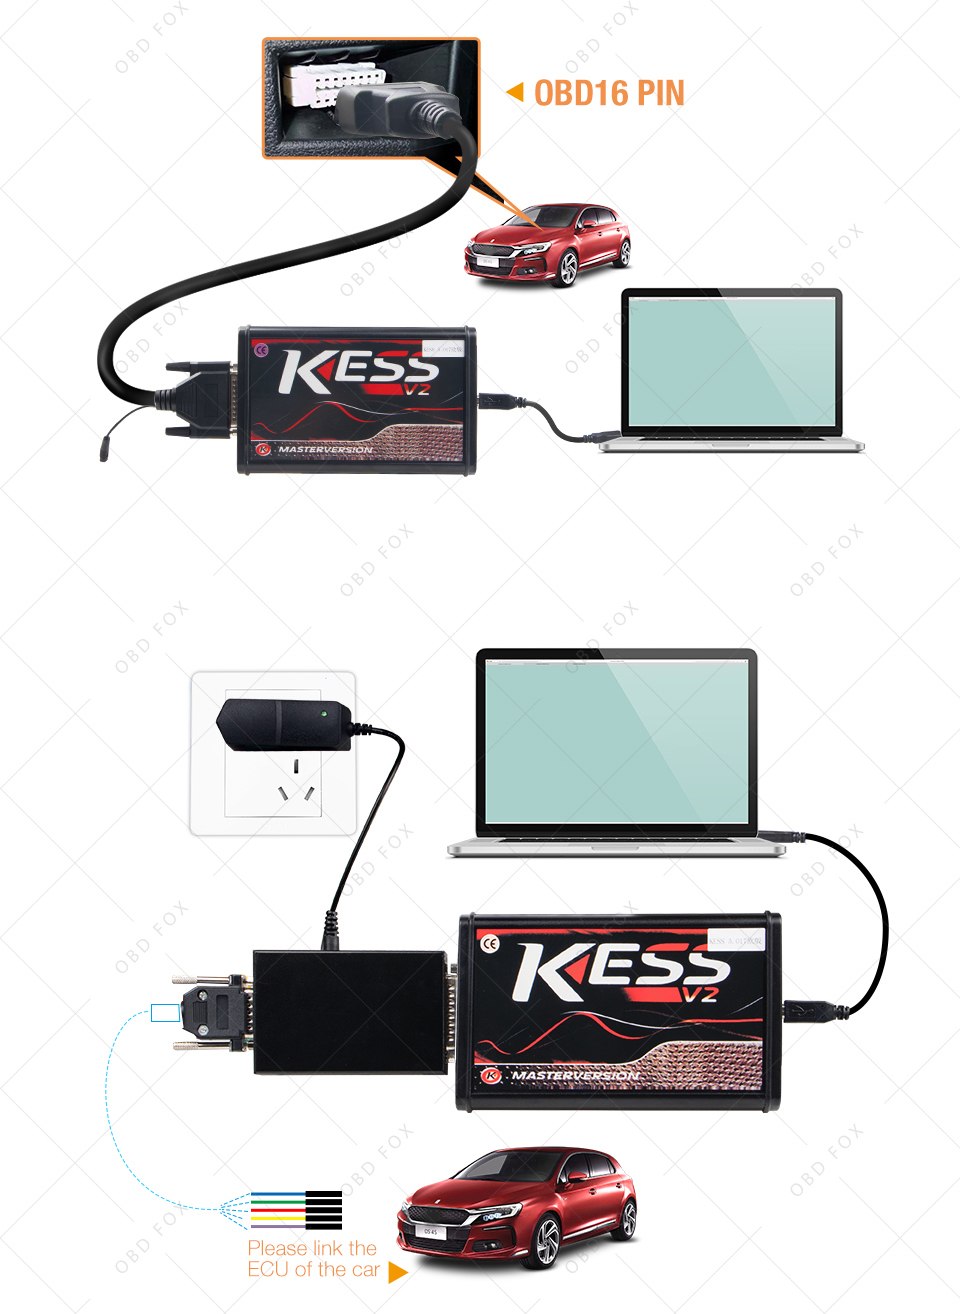 HTB1wcF4VhYaK1RjSZFnq6y80pXar KESS V2 V5.017 full Online V2.47 Manager Tuning Kit KTAG V7.020 4 LED Master K-tag V2.25 KESS BDM Titanium Winols ECU programmer